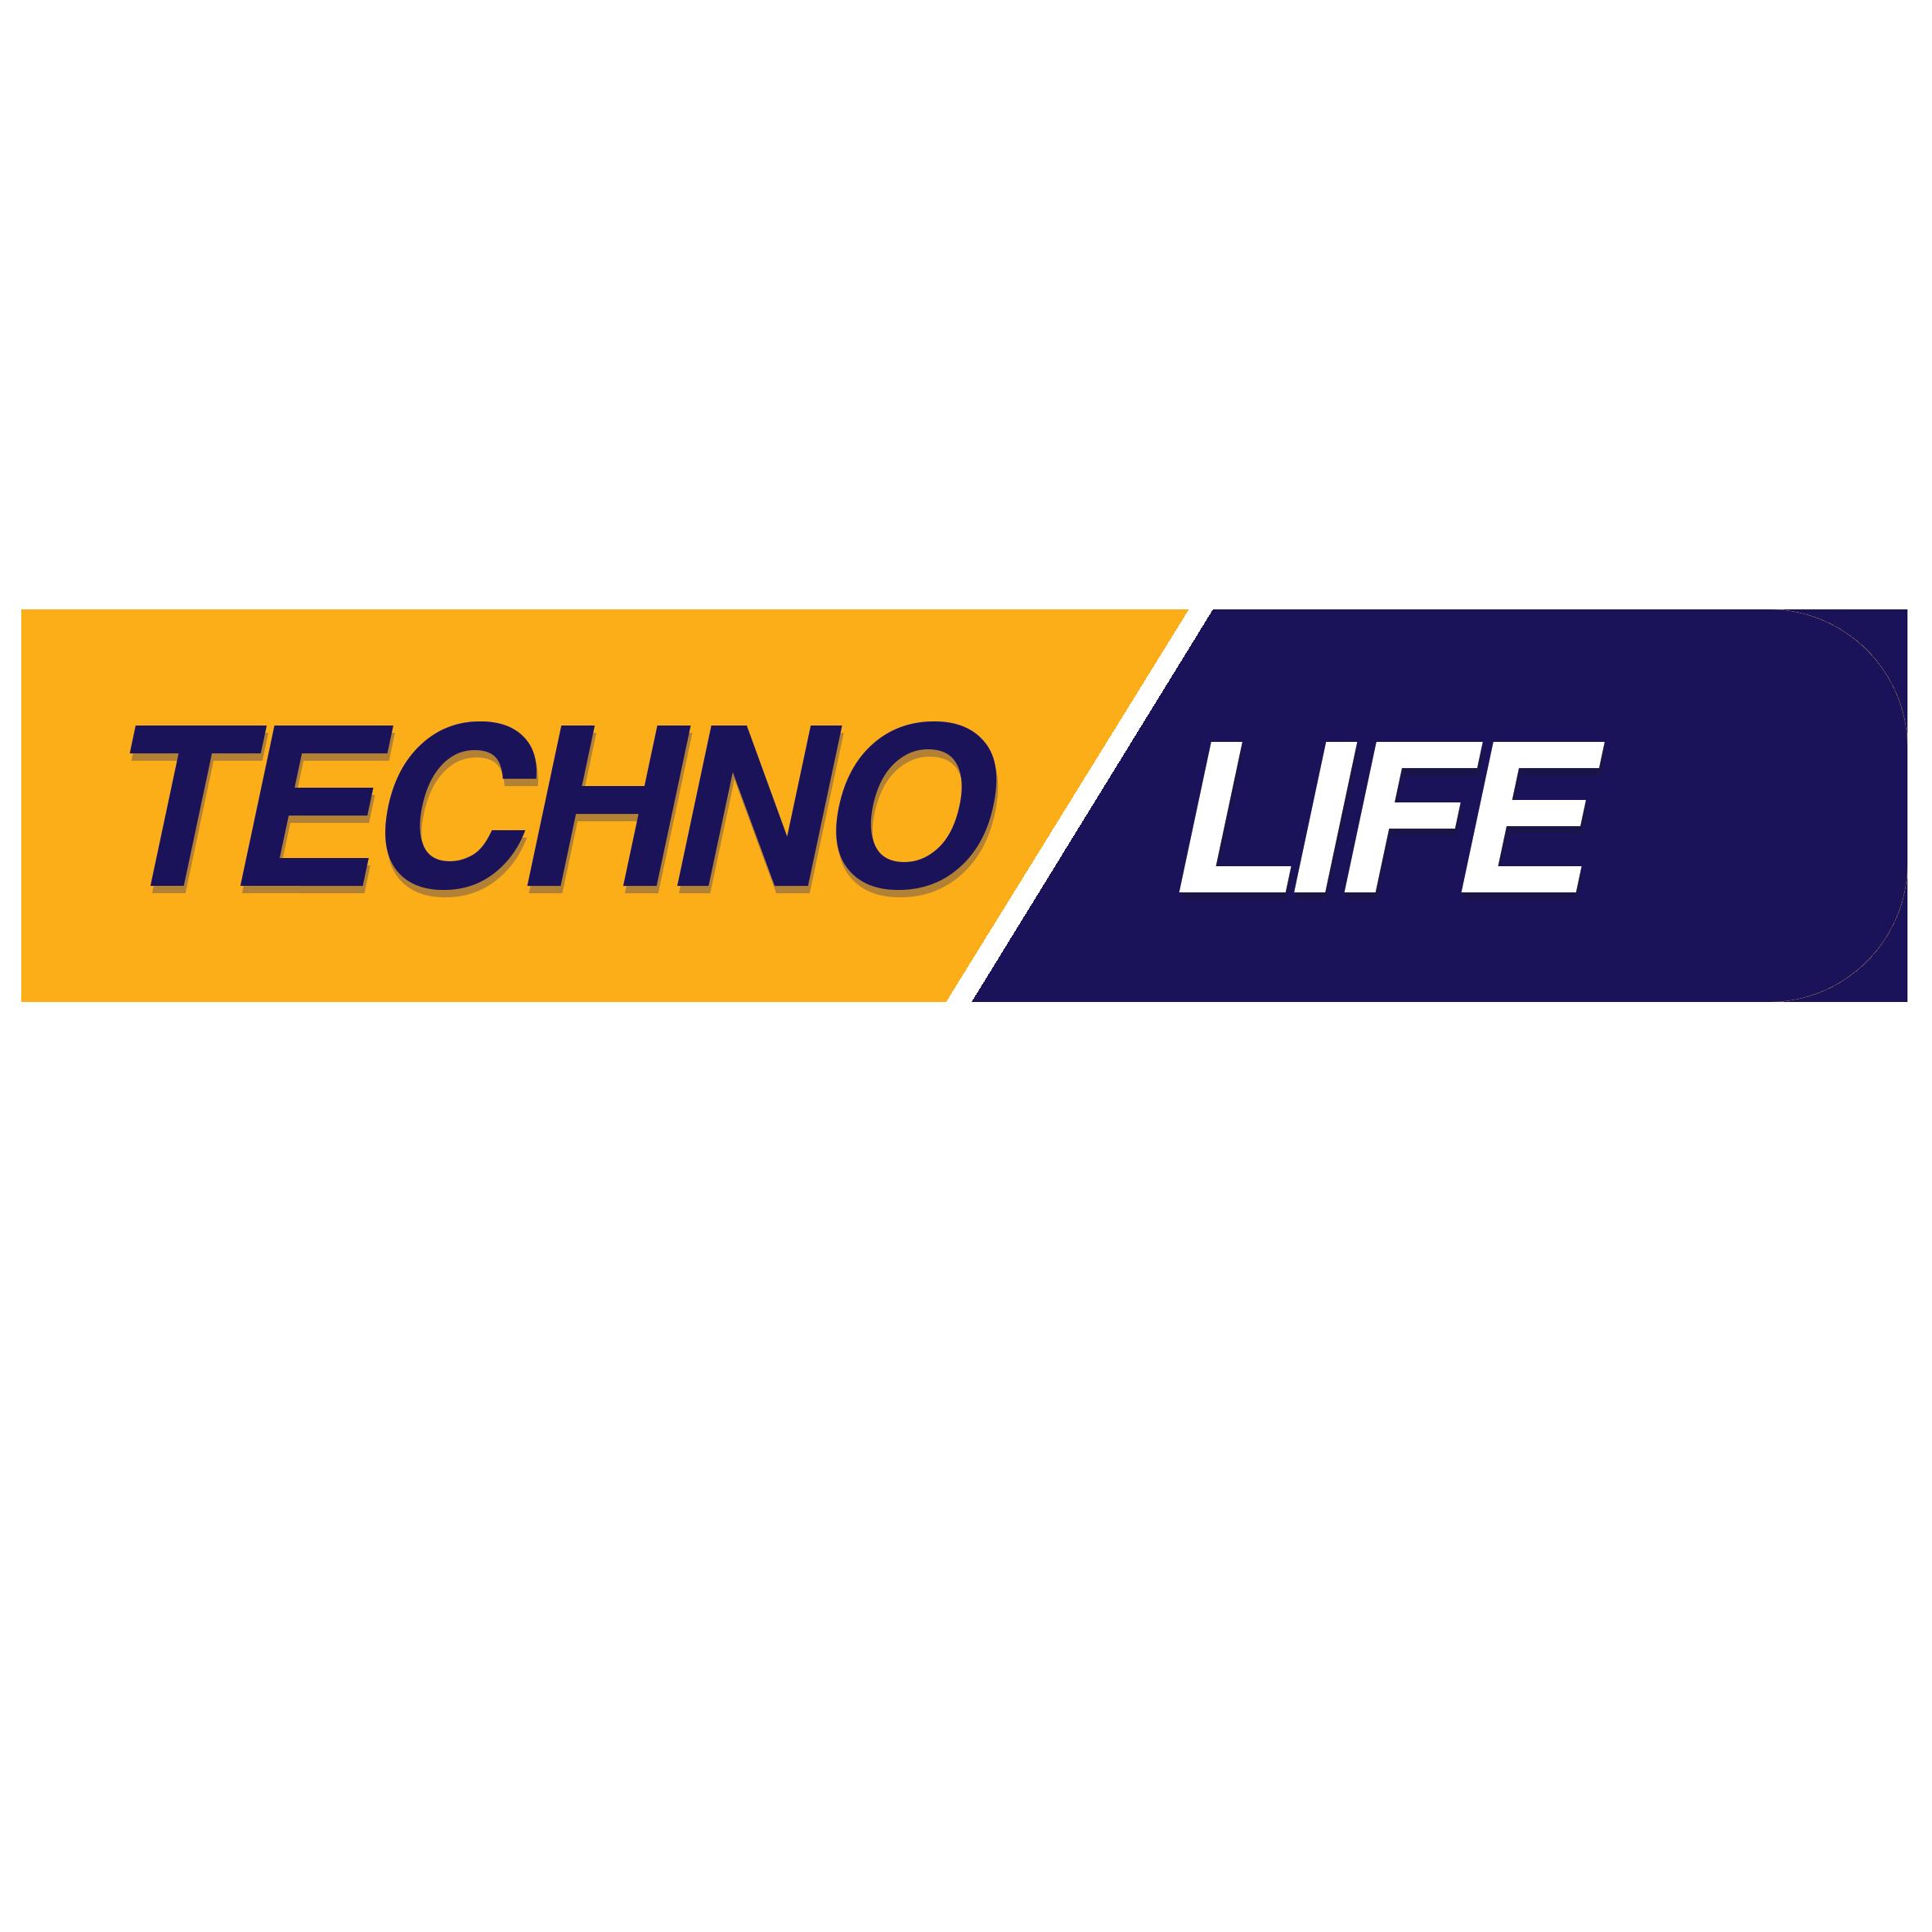 techno life